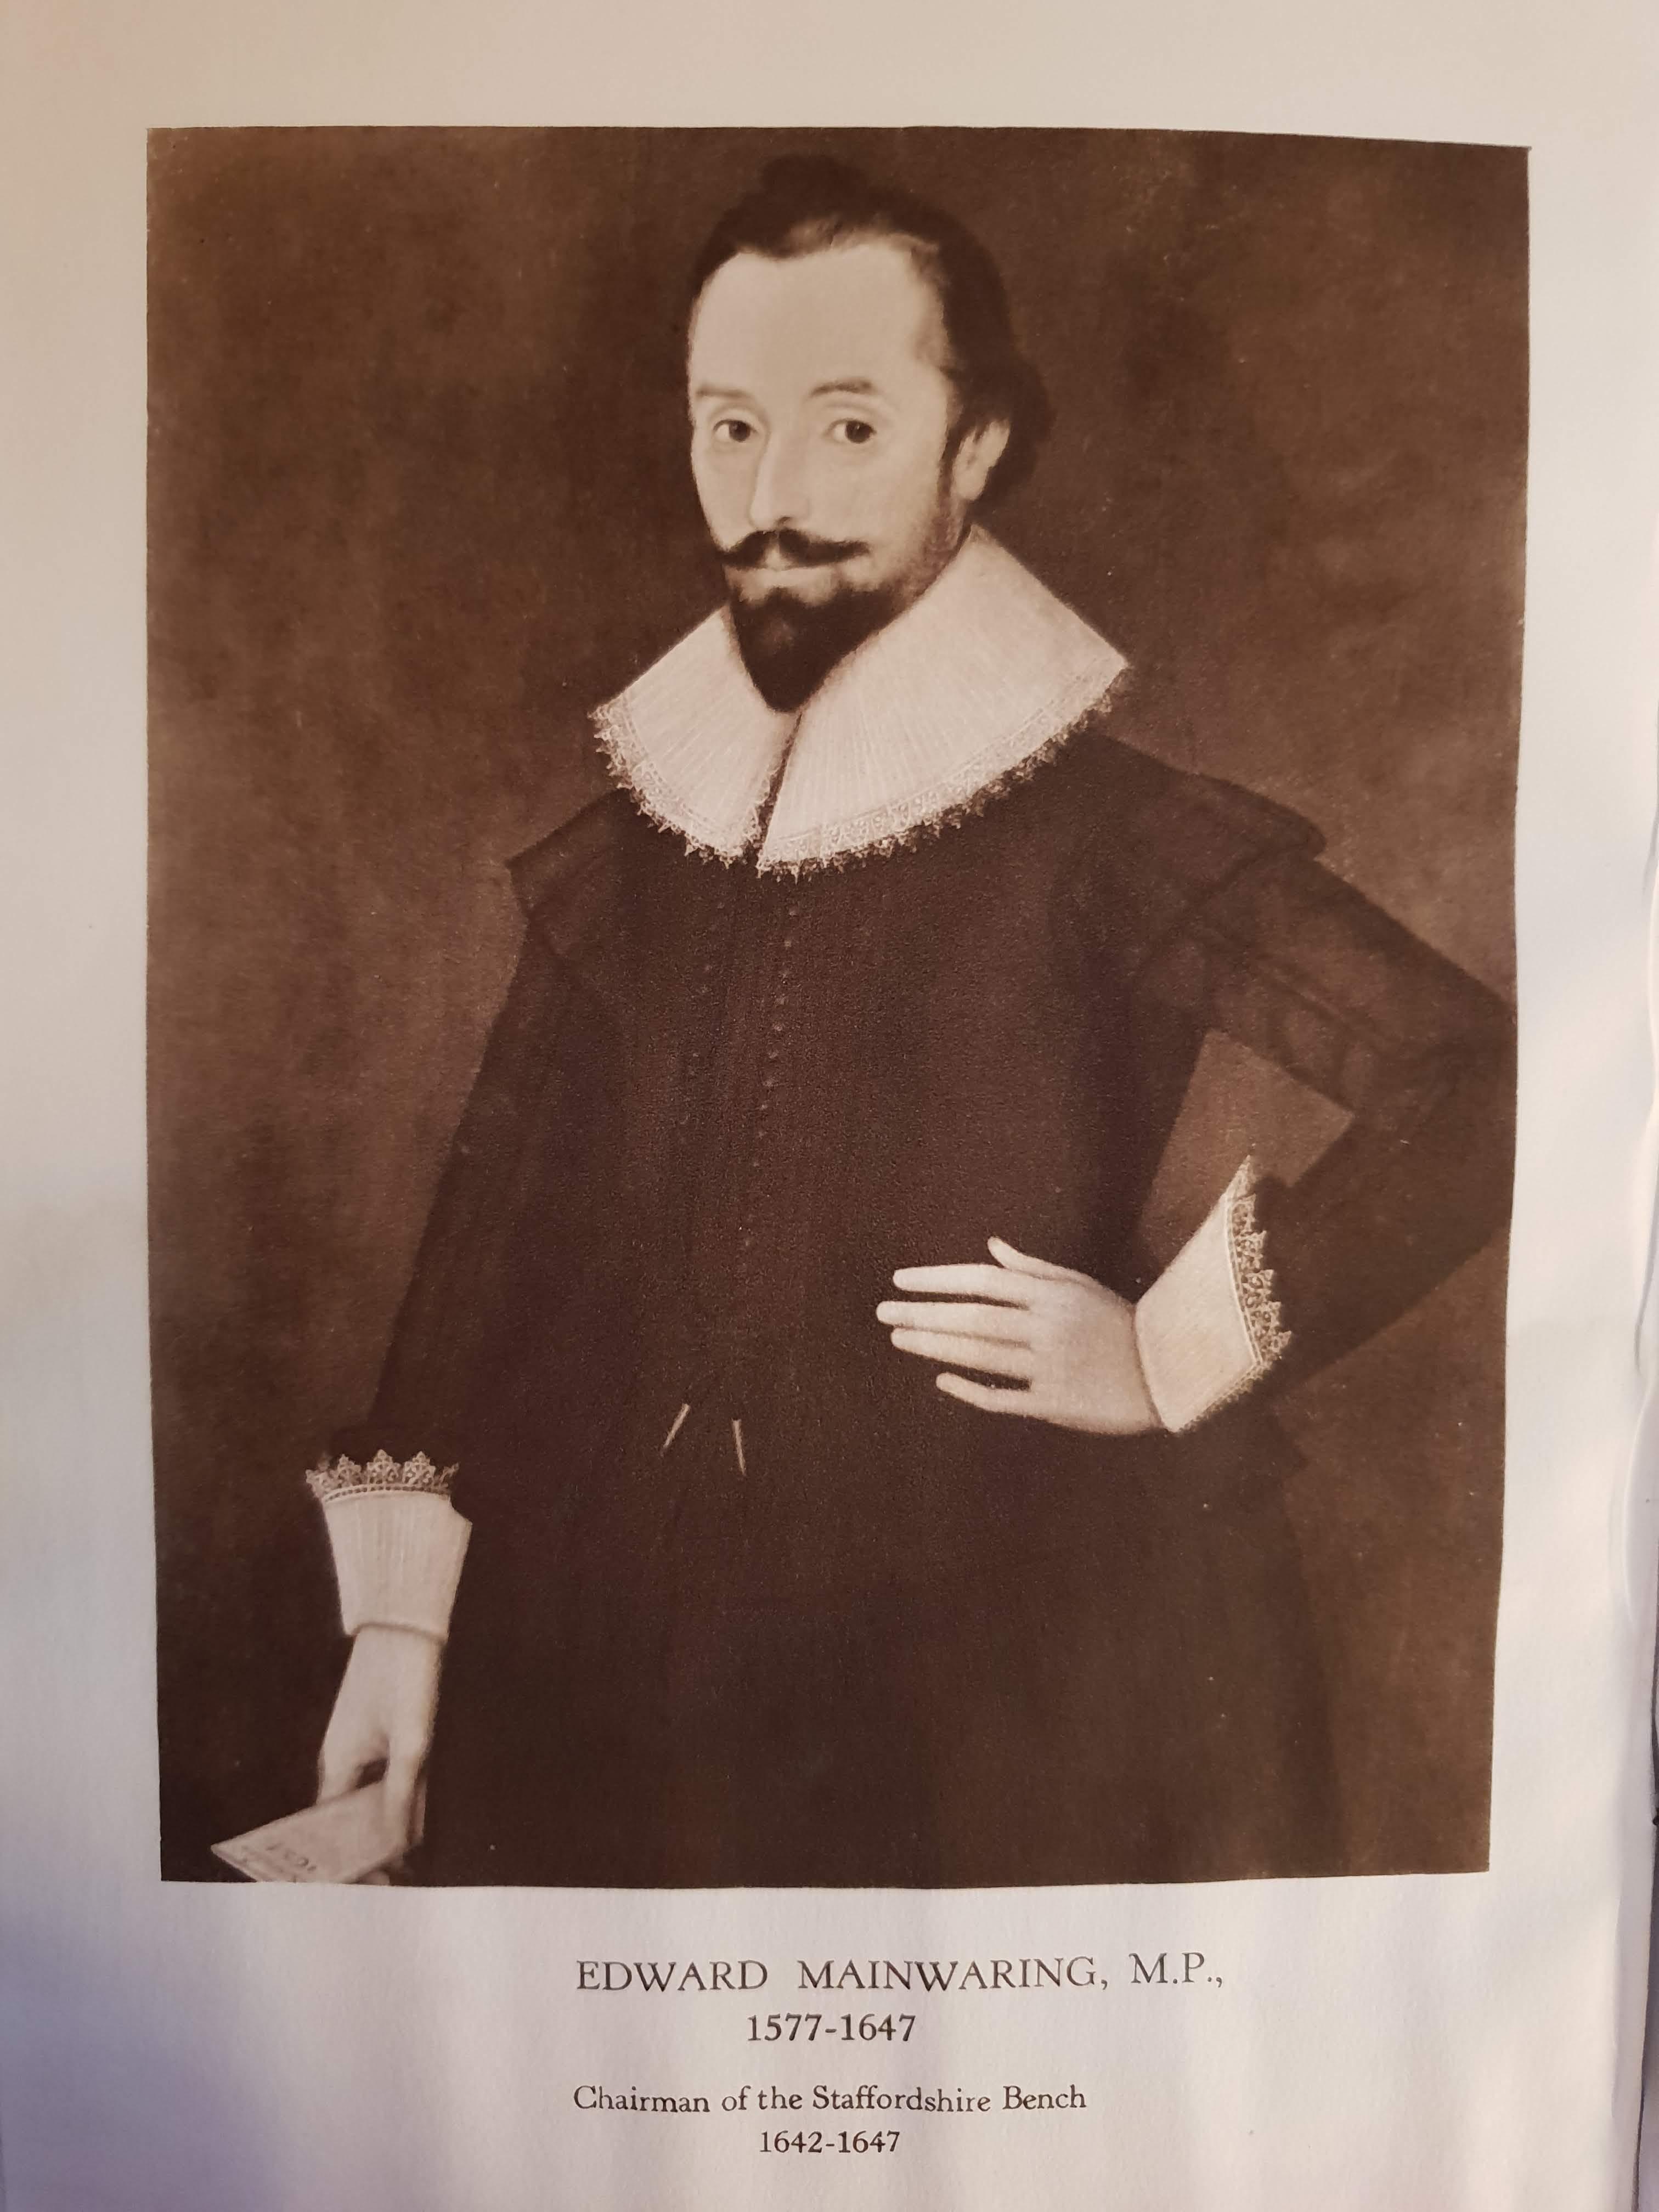 Mainwaring Edward 1577 - 1647